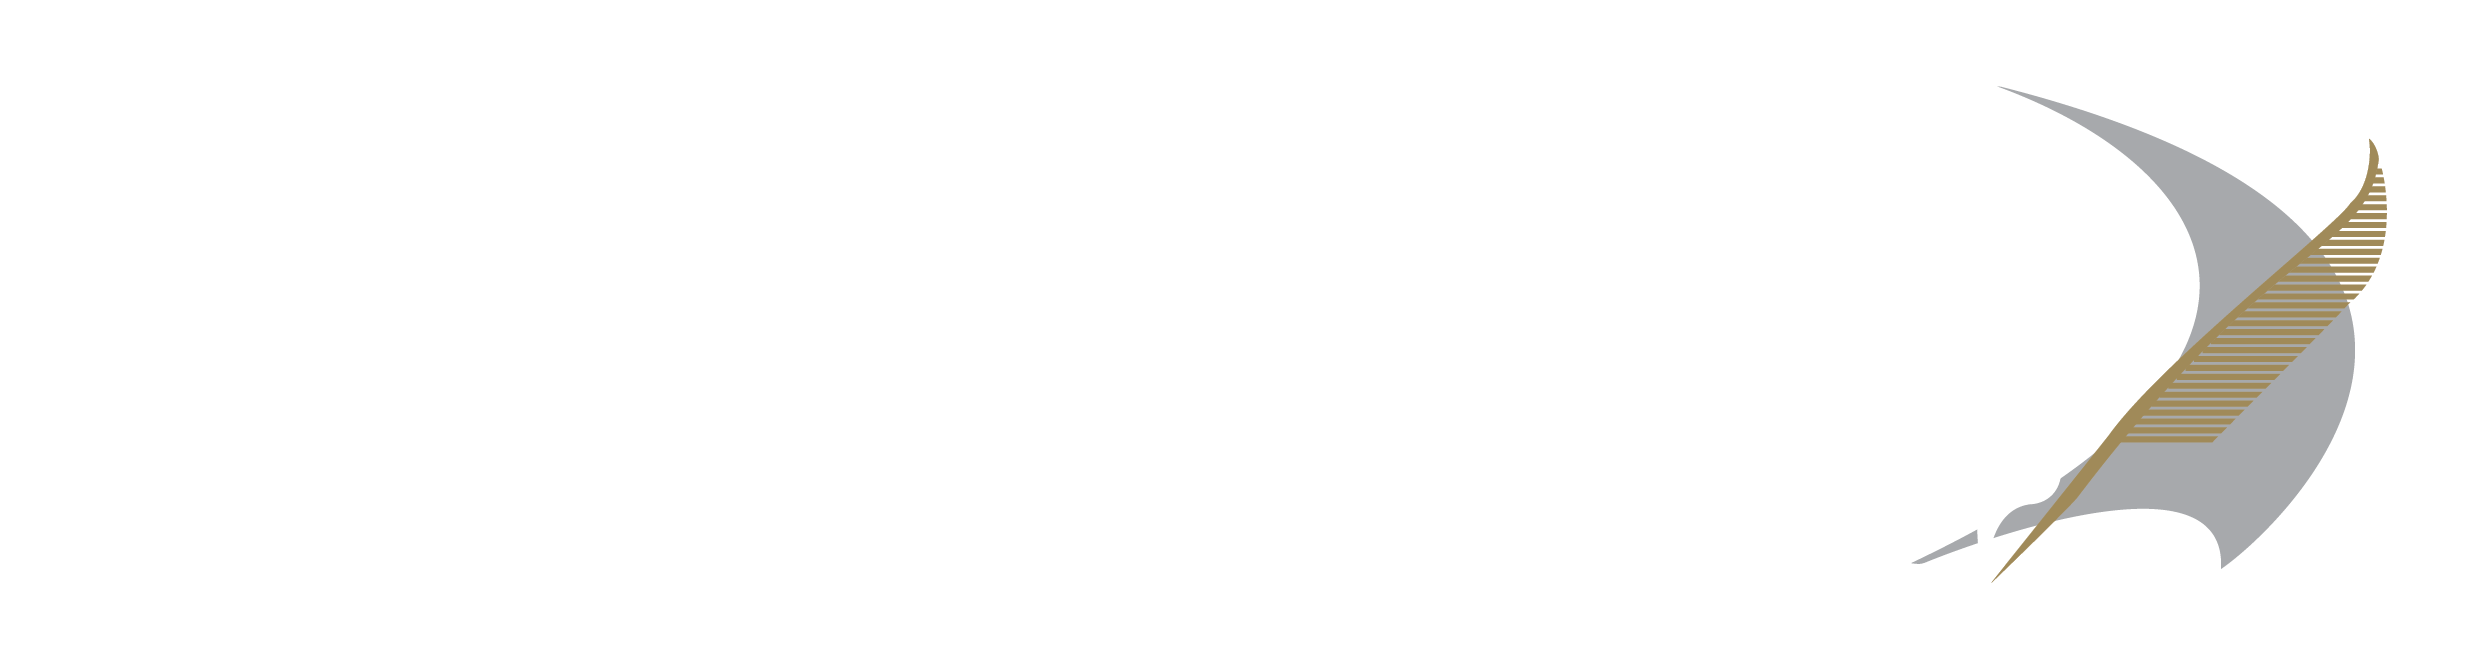 Gulf University International Journals